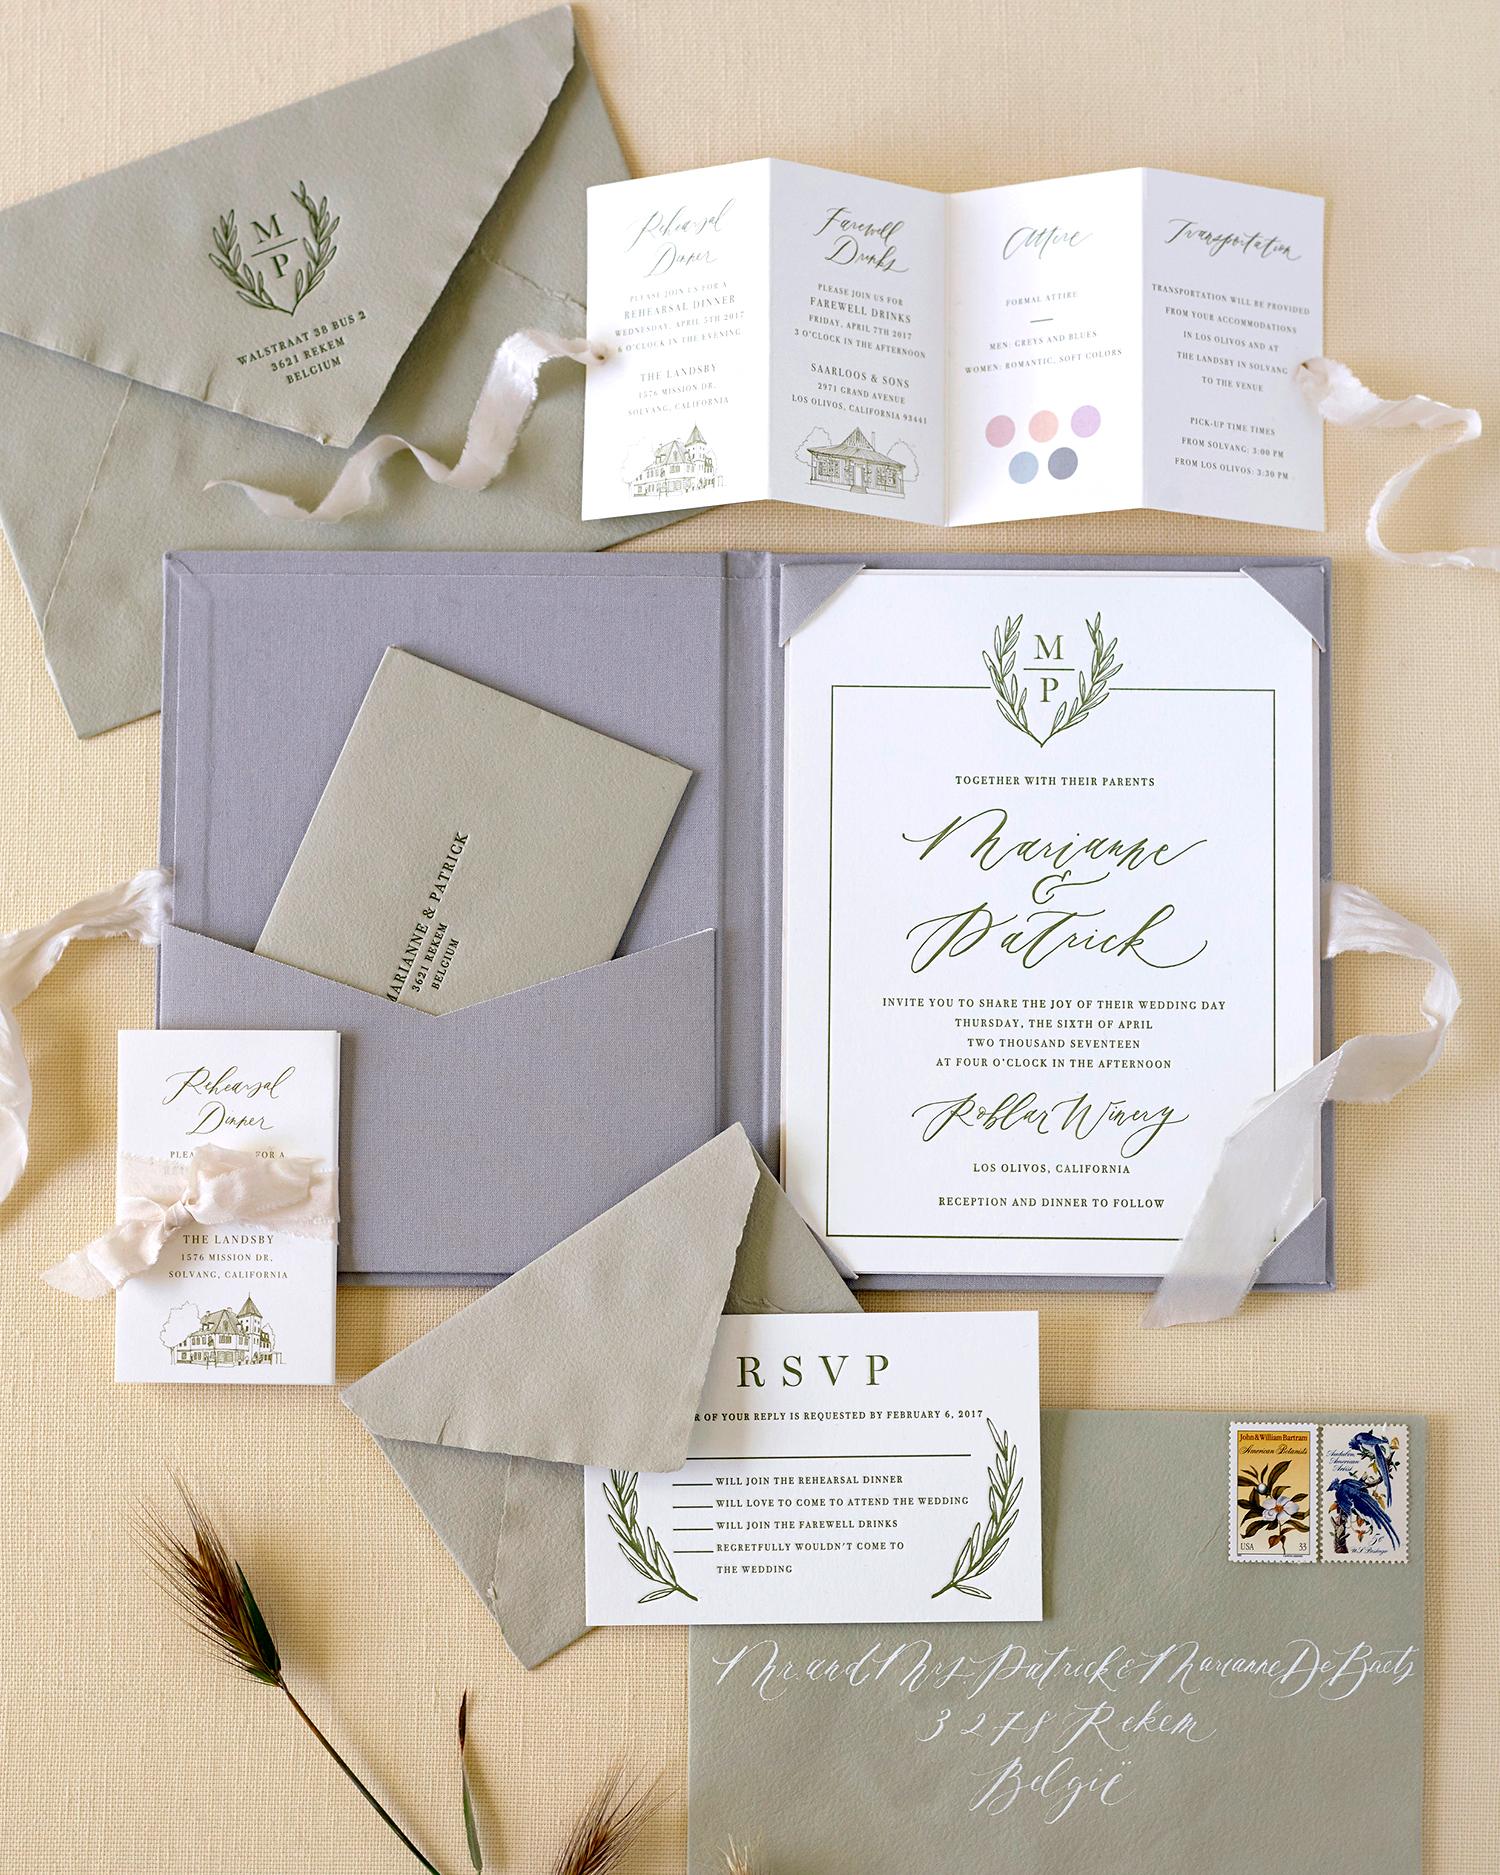 marianne patrick wedding stationery